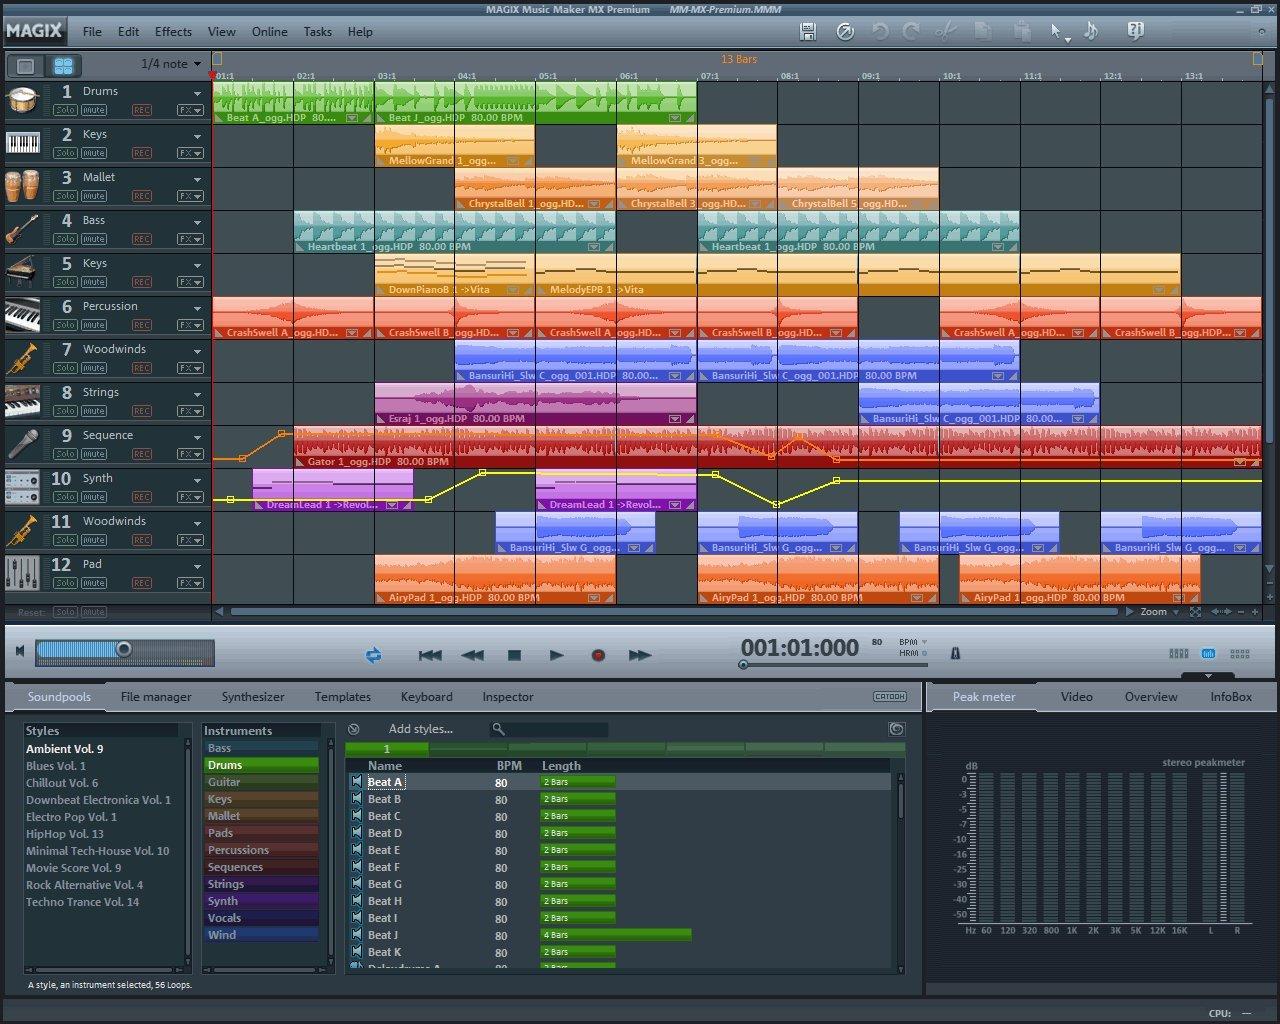 Music Maker MX Premium [Download] by MAGIX